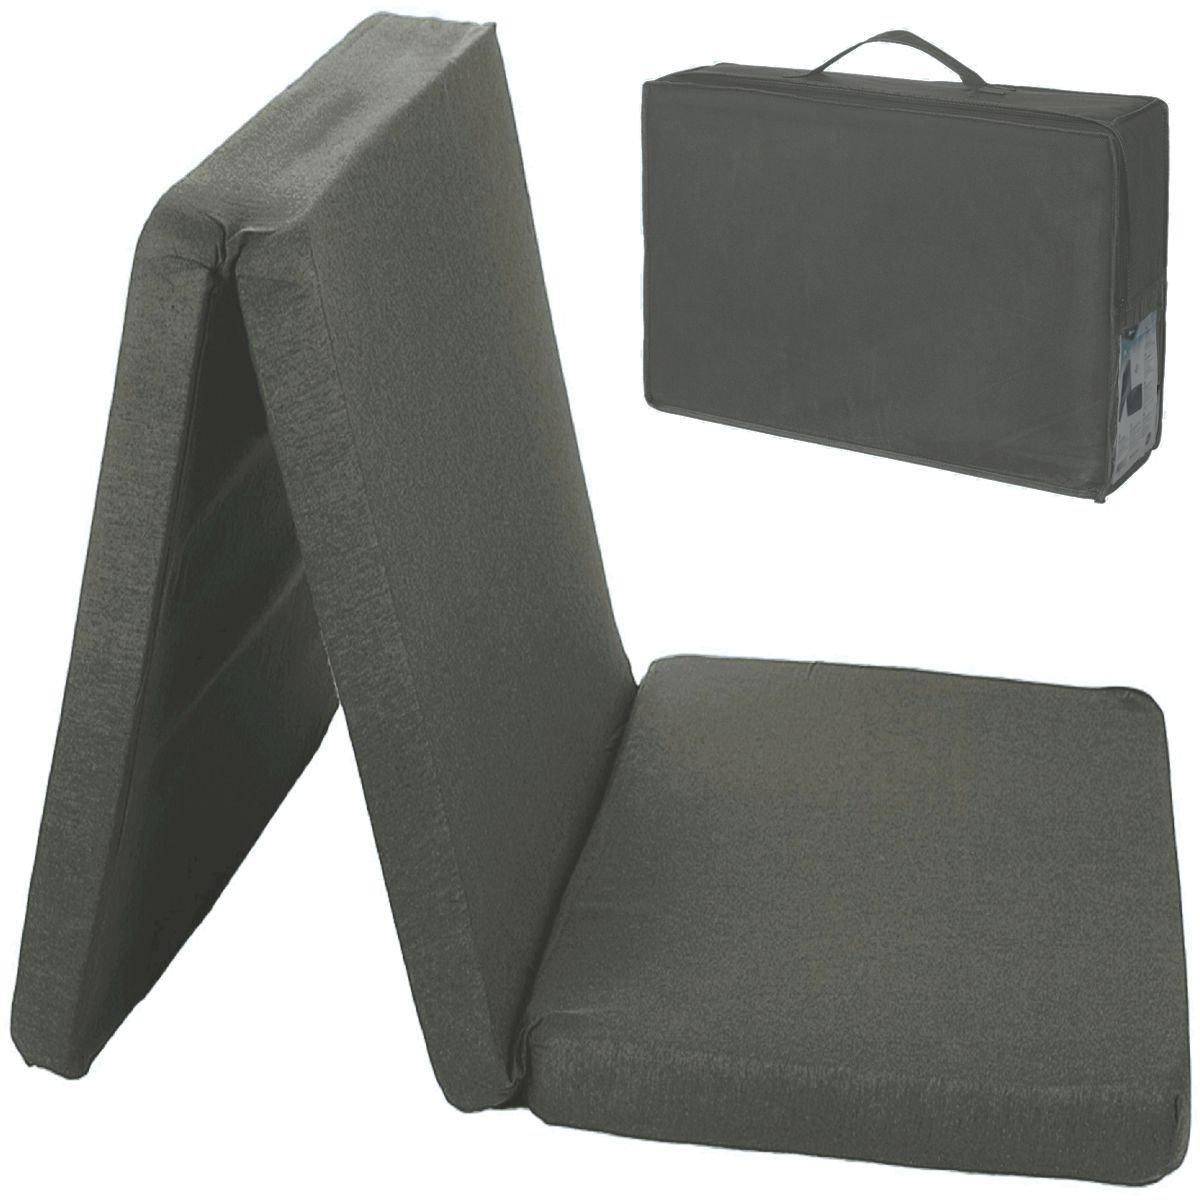 Tasche 120x60cm Reisebett Kinderbett Baby Kind Matratze Bett Reisebettmatratze GRAU